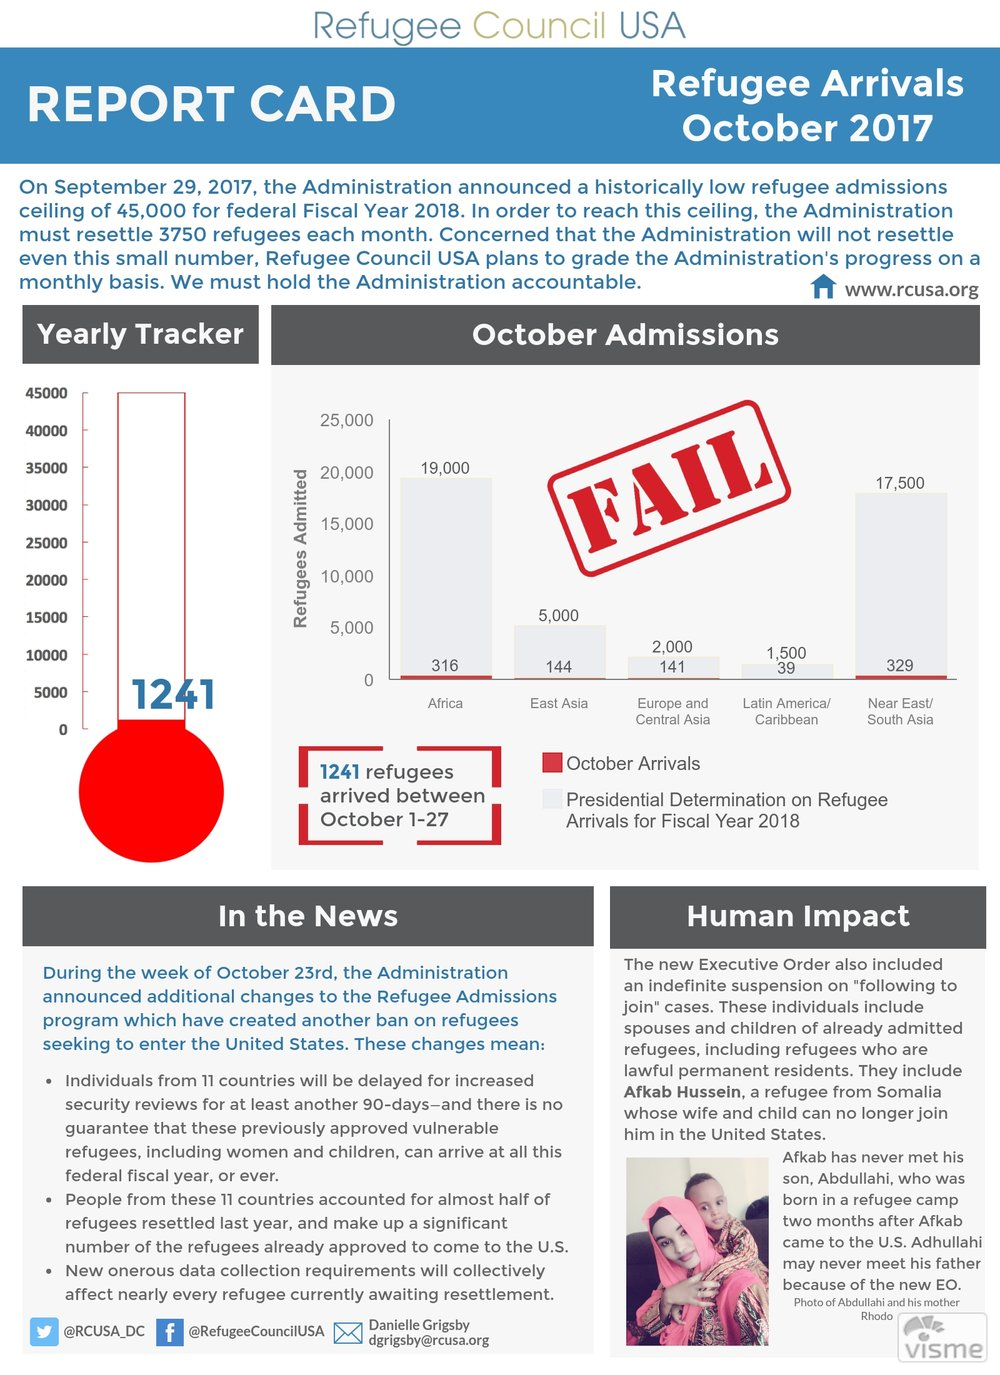 REPORT-CARD (9).jpg